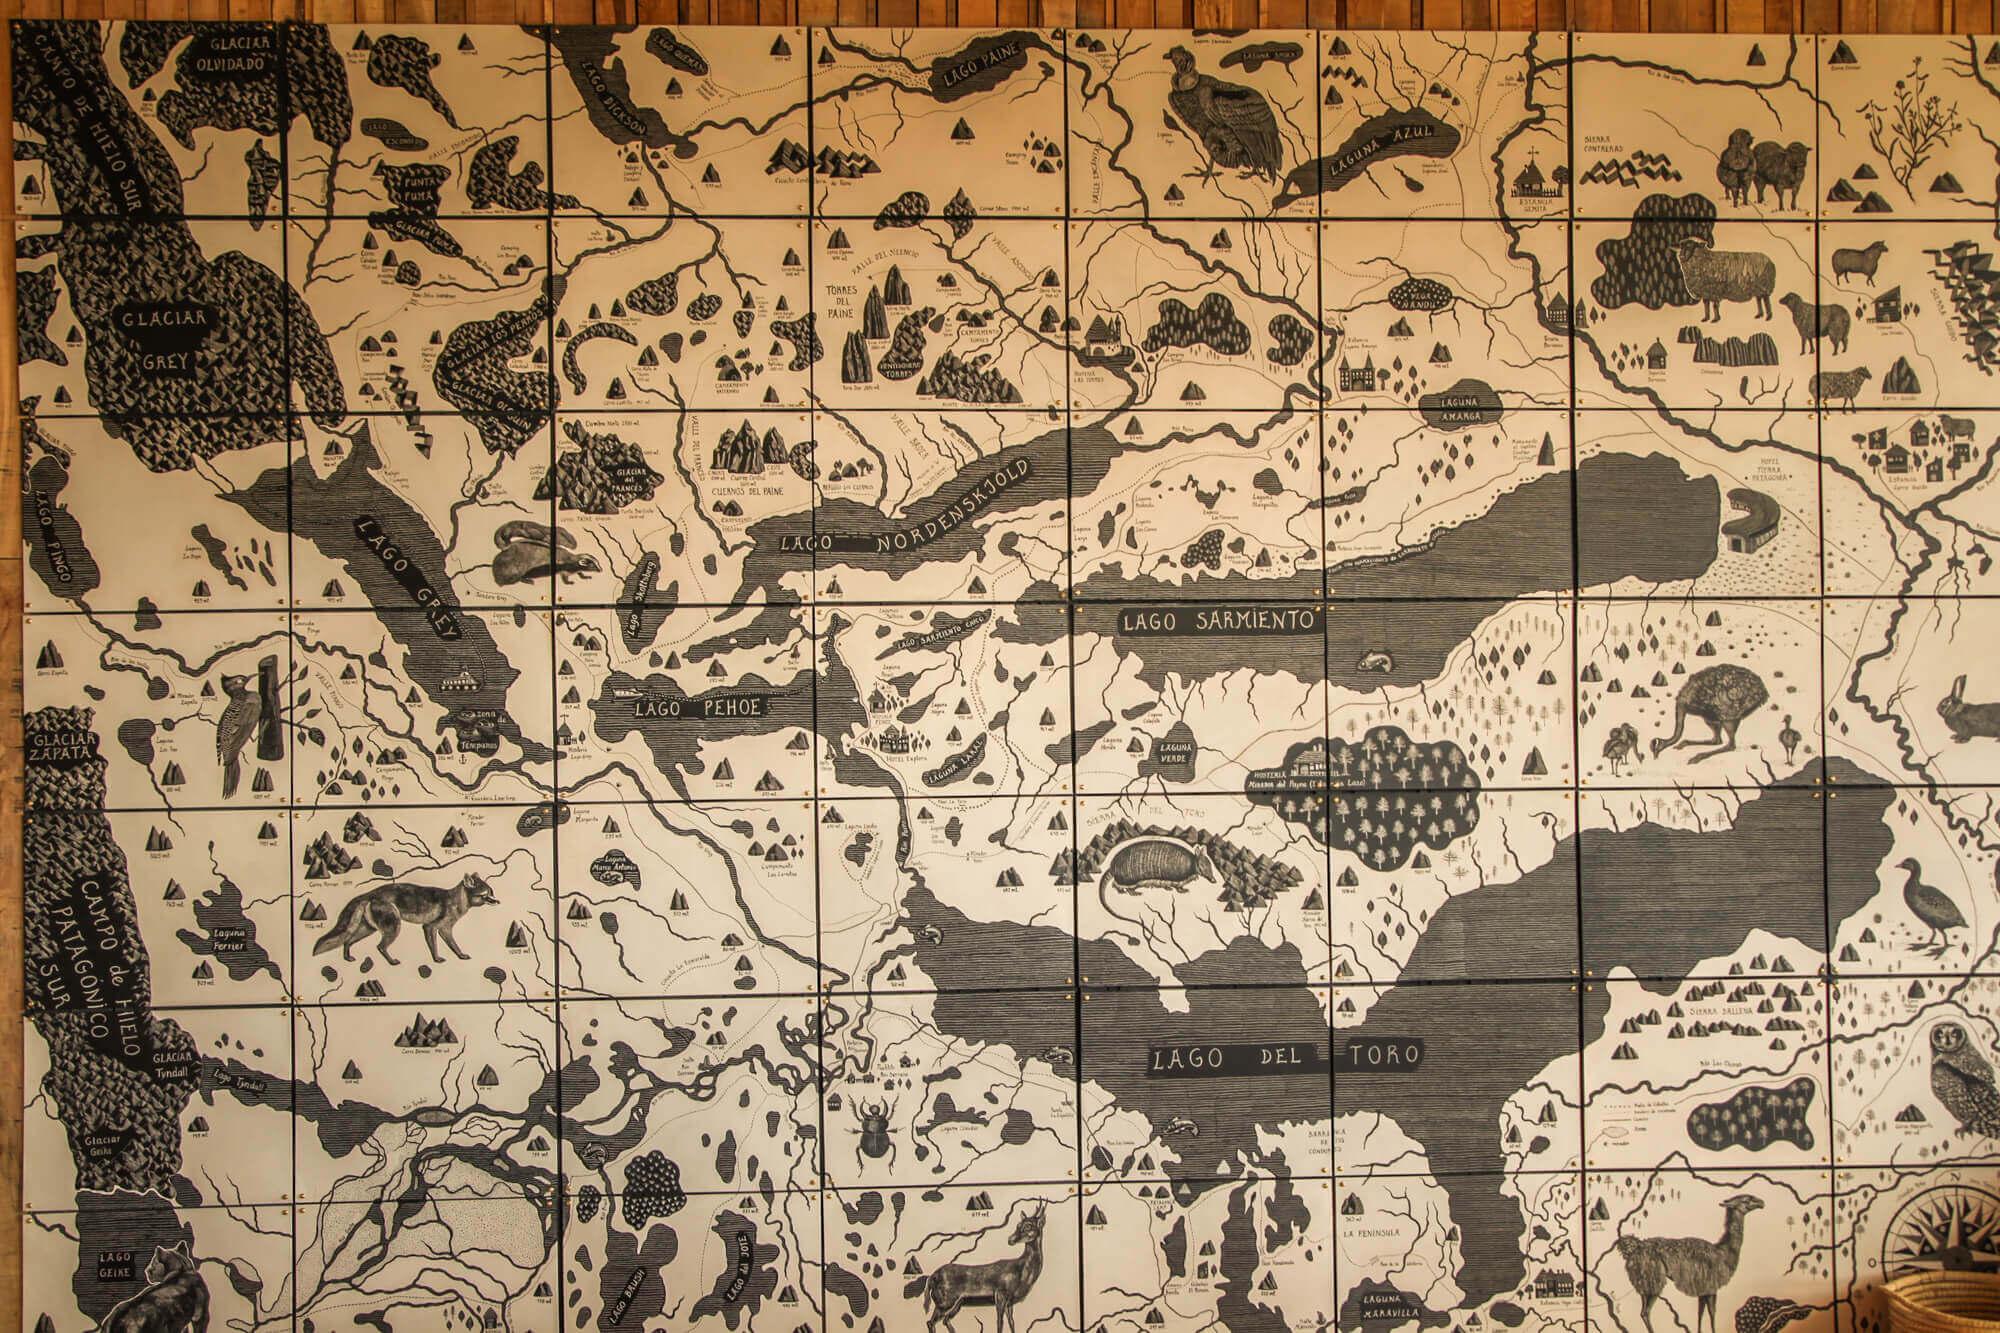 Tierra Patagonia Adventure Map